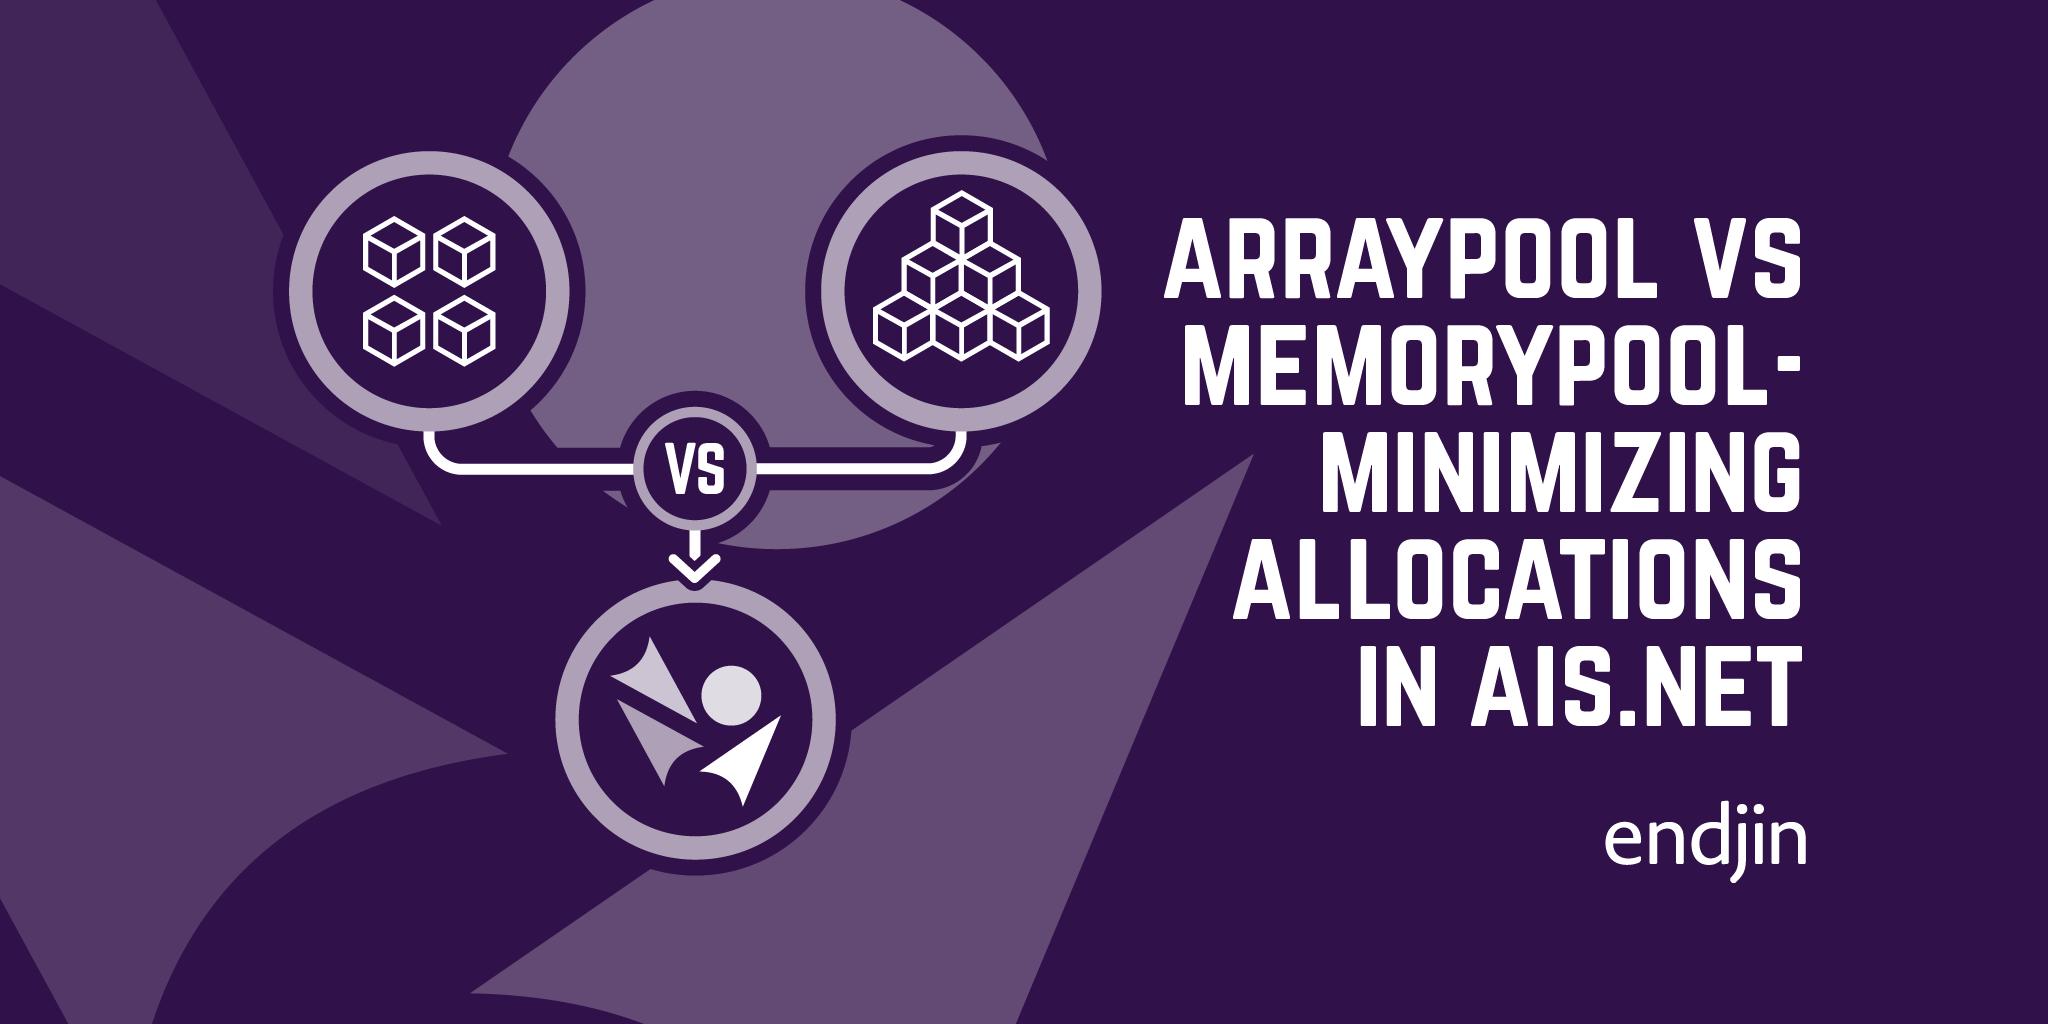 ArrayPool vs MemoryPool—minimizing allocations in AIS.NET